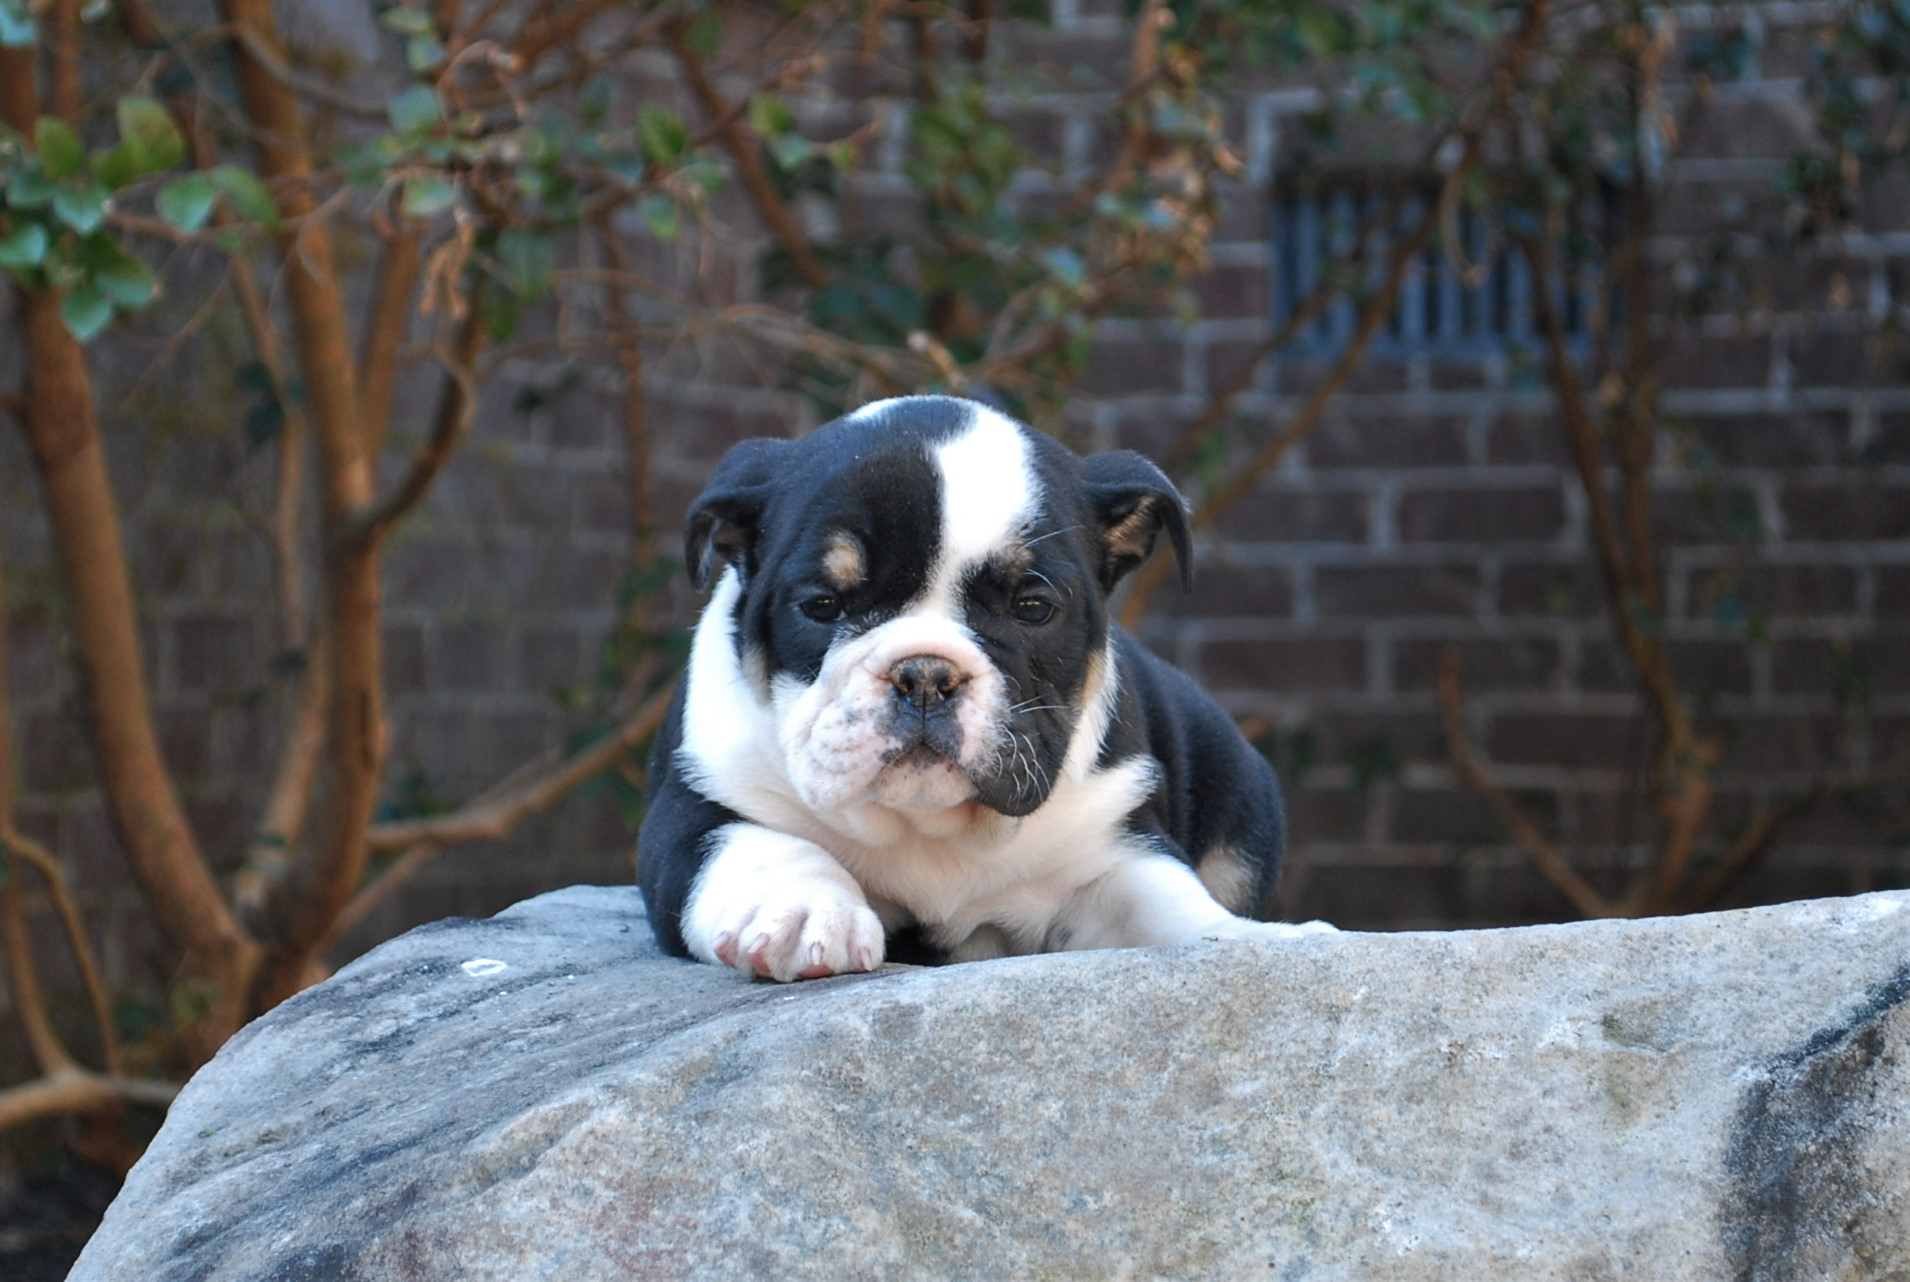 Patsie Olde English Bulldogge Puppy For Sale | Photo 4